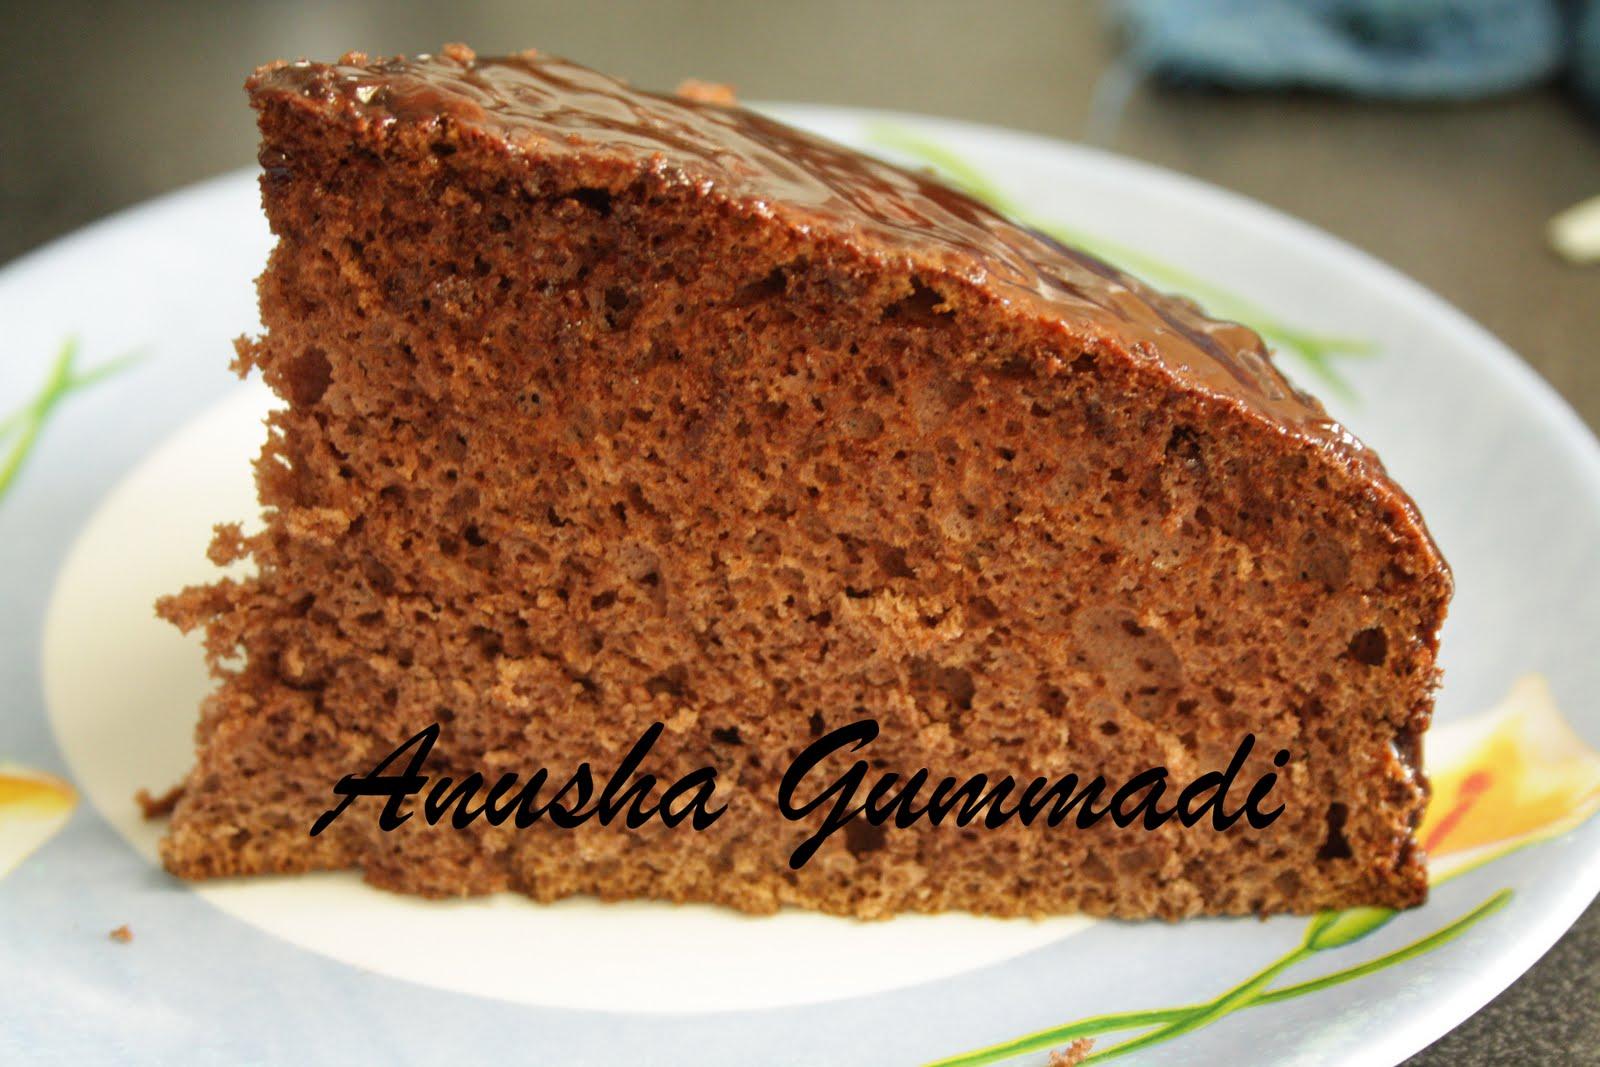 Colourful flavors chocolate sponge cake for Chocolate sponge ingredients